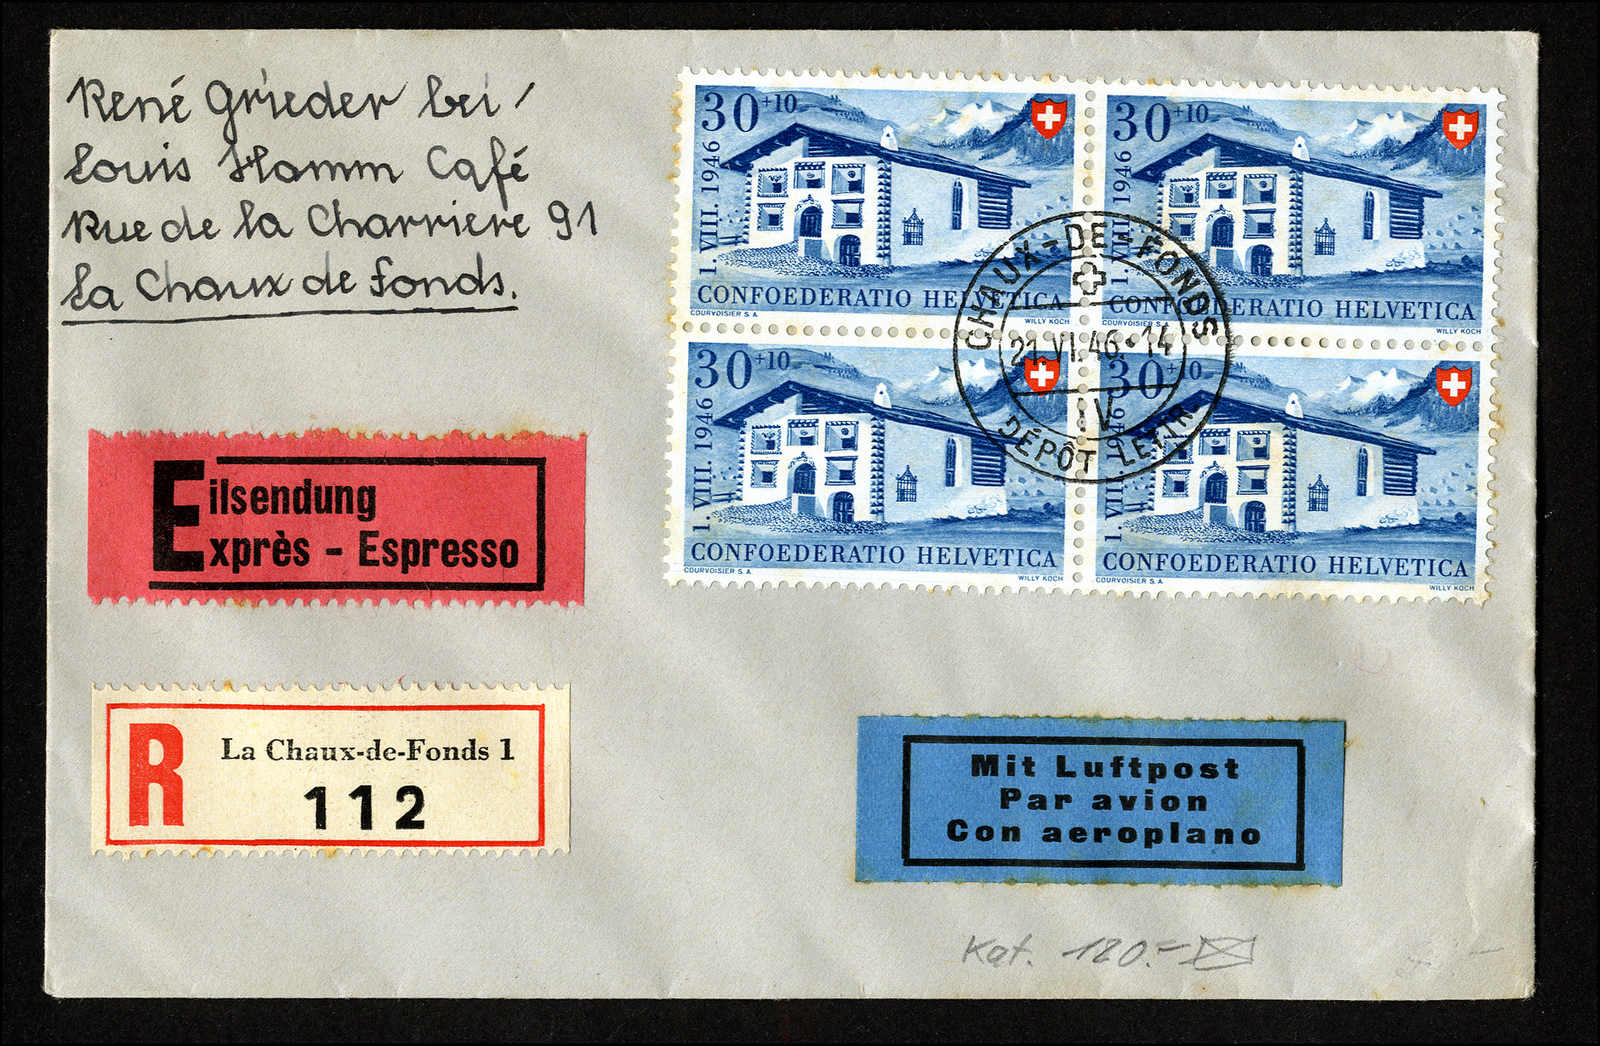 Lot 208 - schweiz schweiz pro patria -  Rolli Auctions Auction #68 Day 1